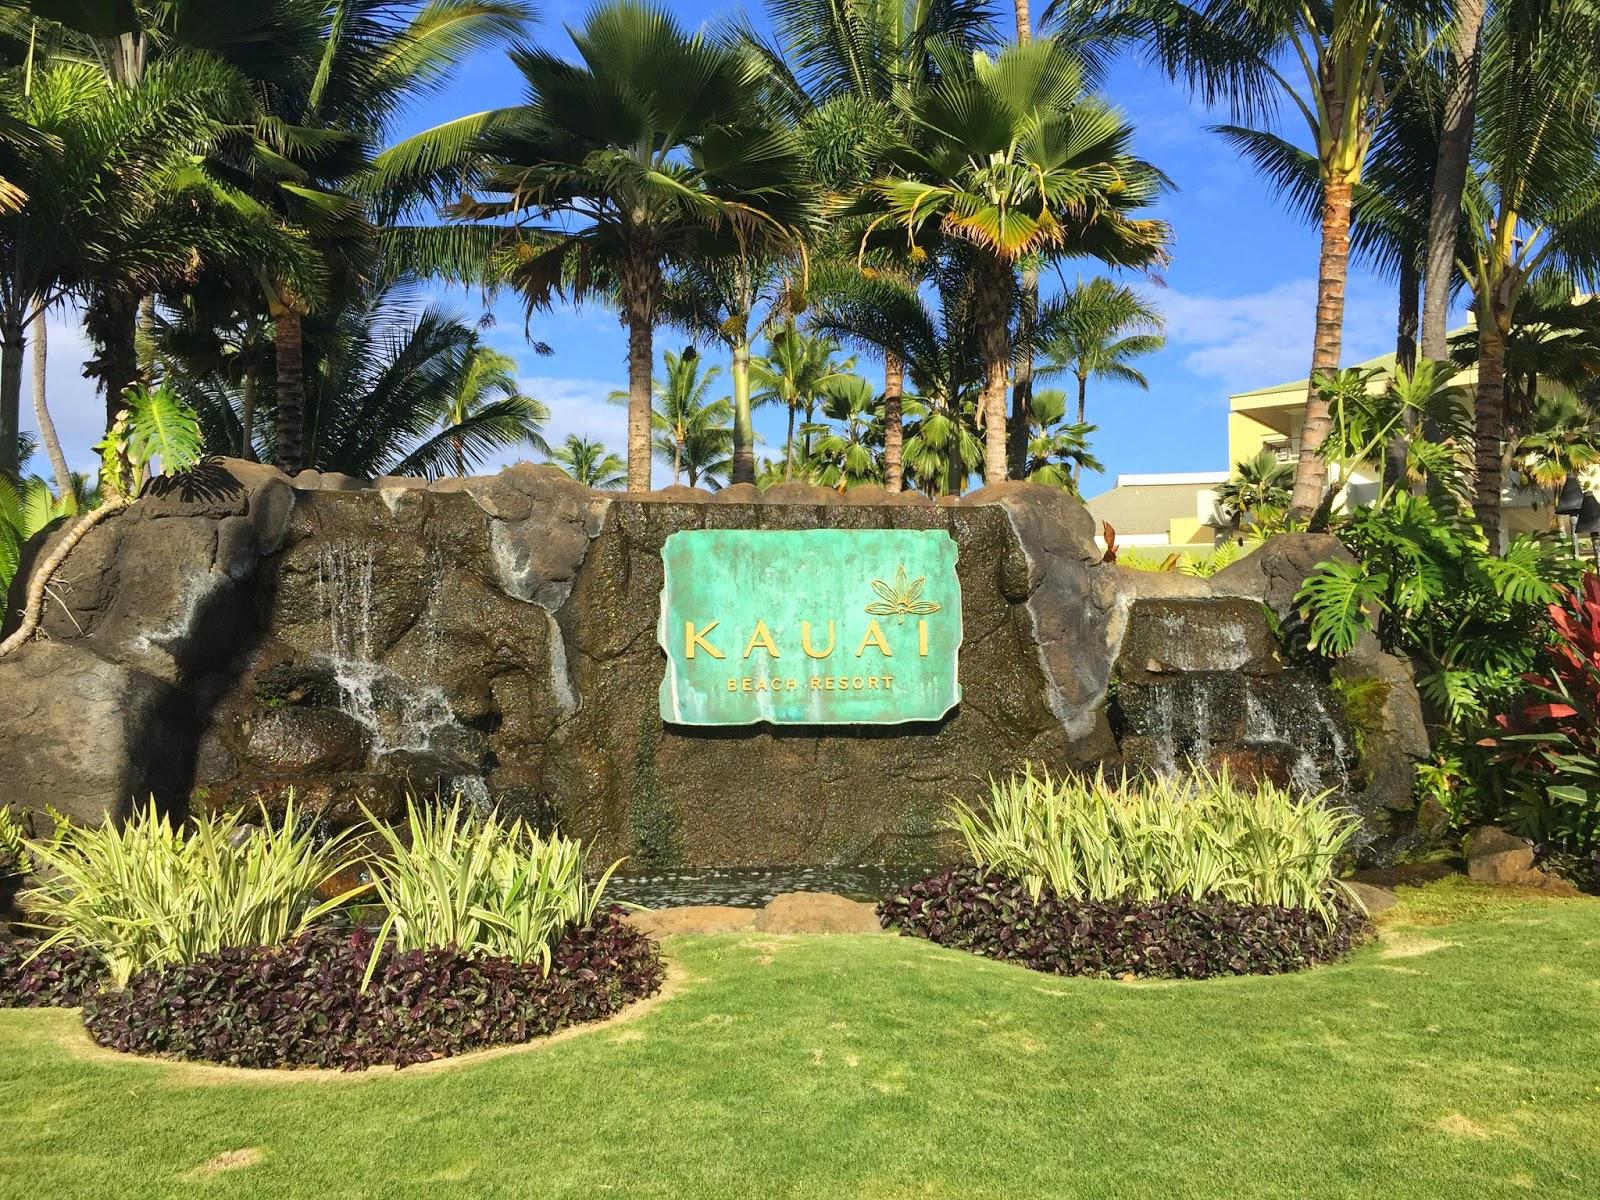 TASTE OF HAWAII: NAUPAKA TERRACE - KAUAI BEACH RESORT